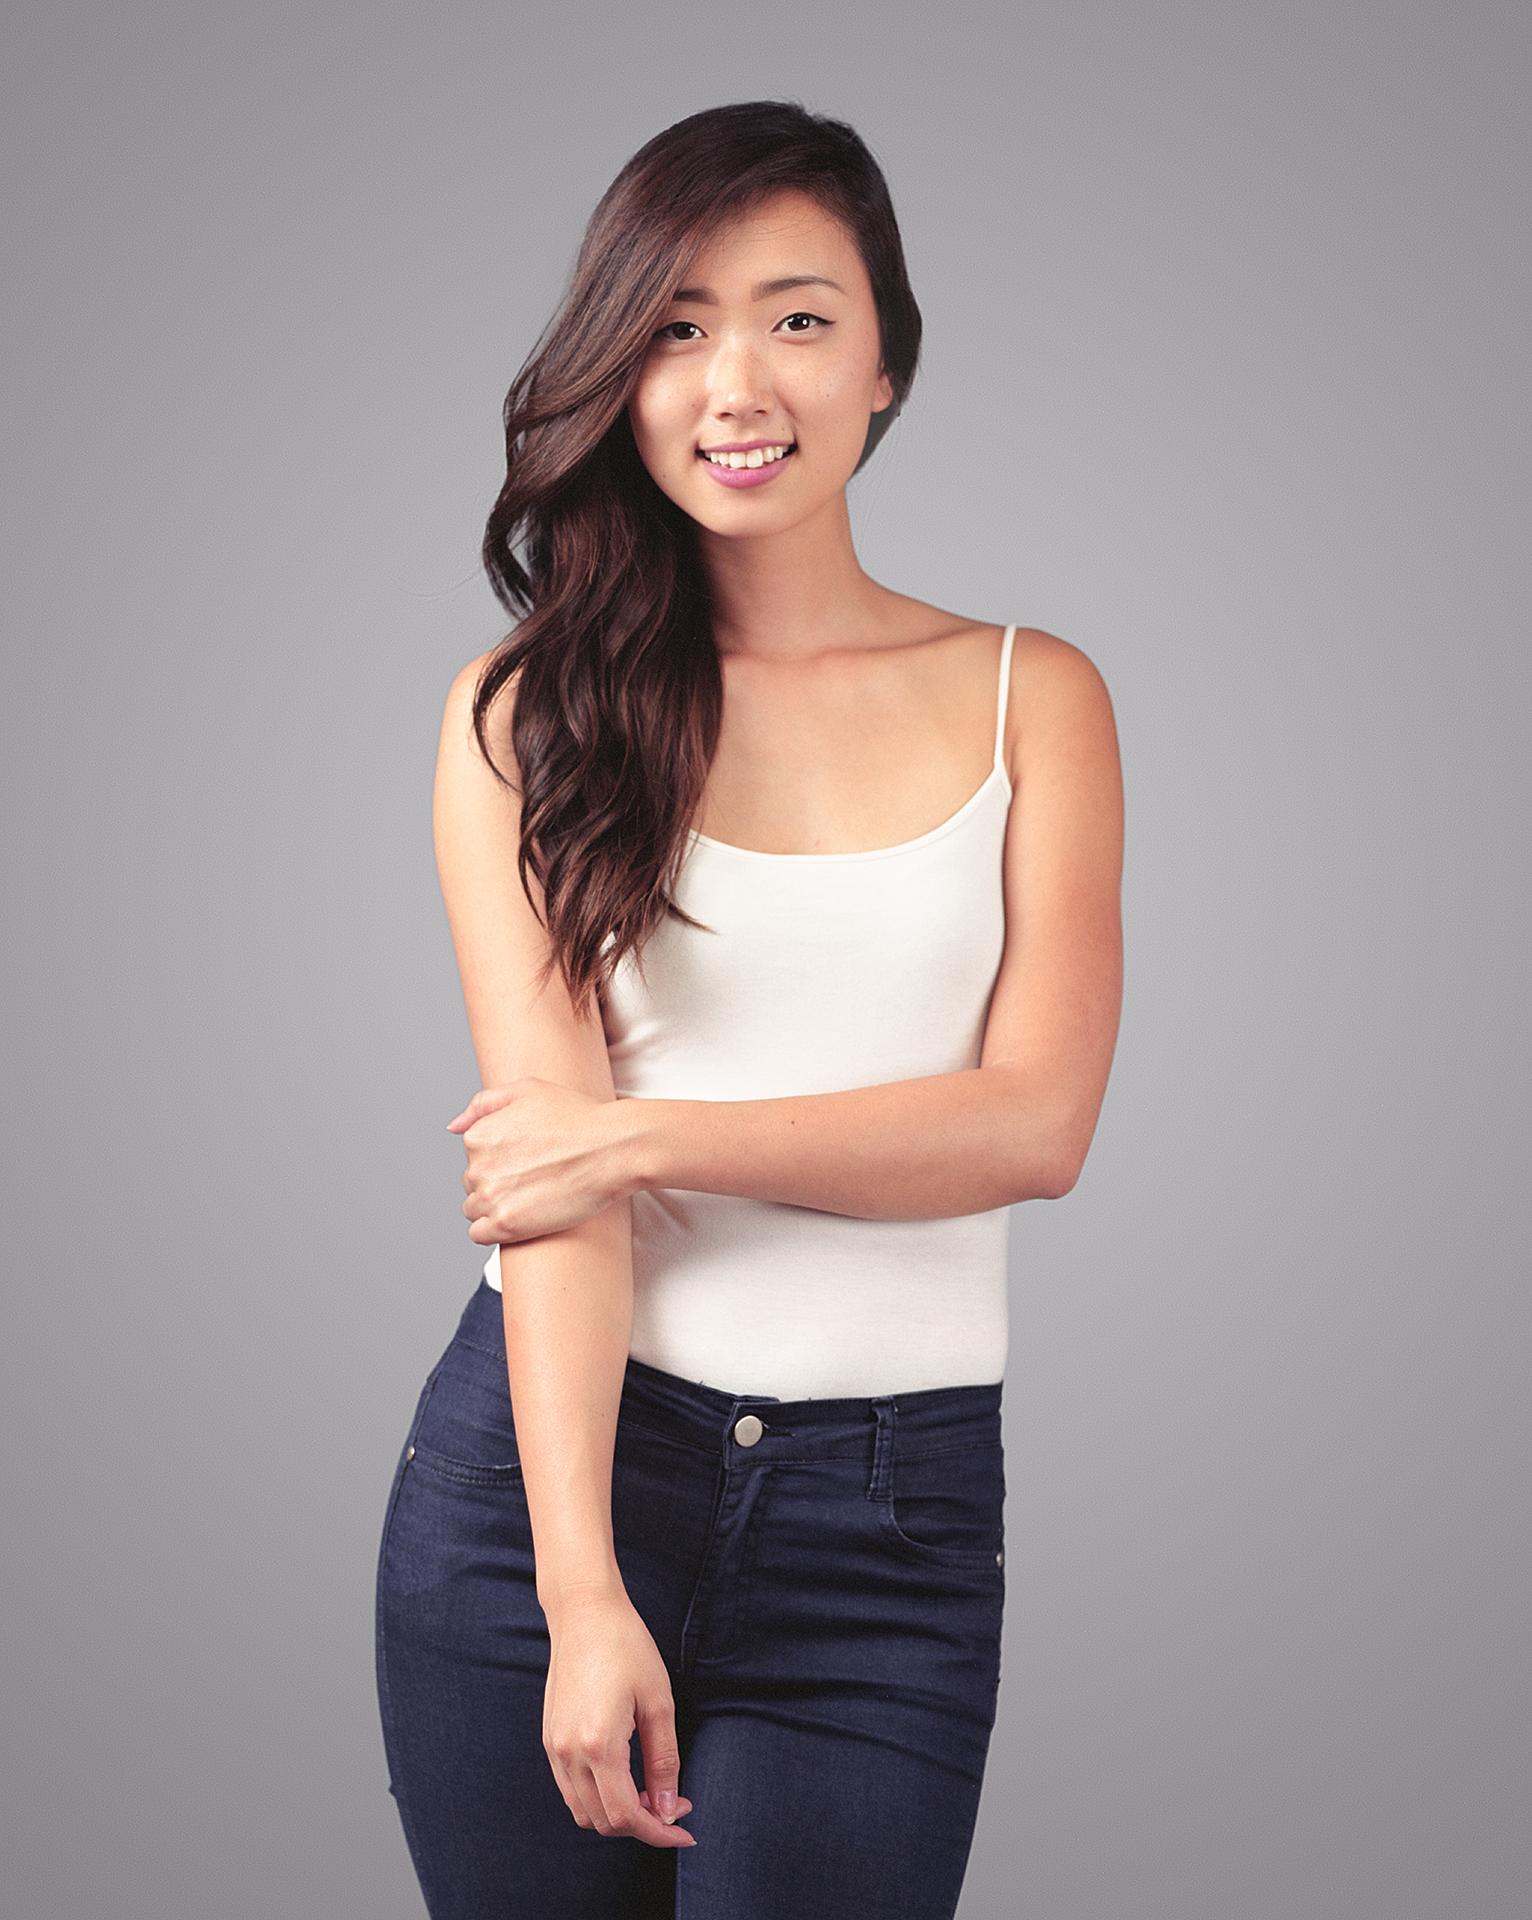 3/4 length studio portrait of Korean American model Shawna Kim